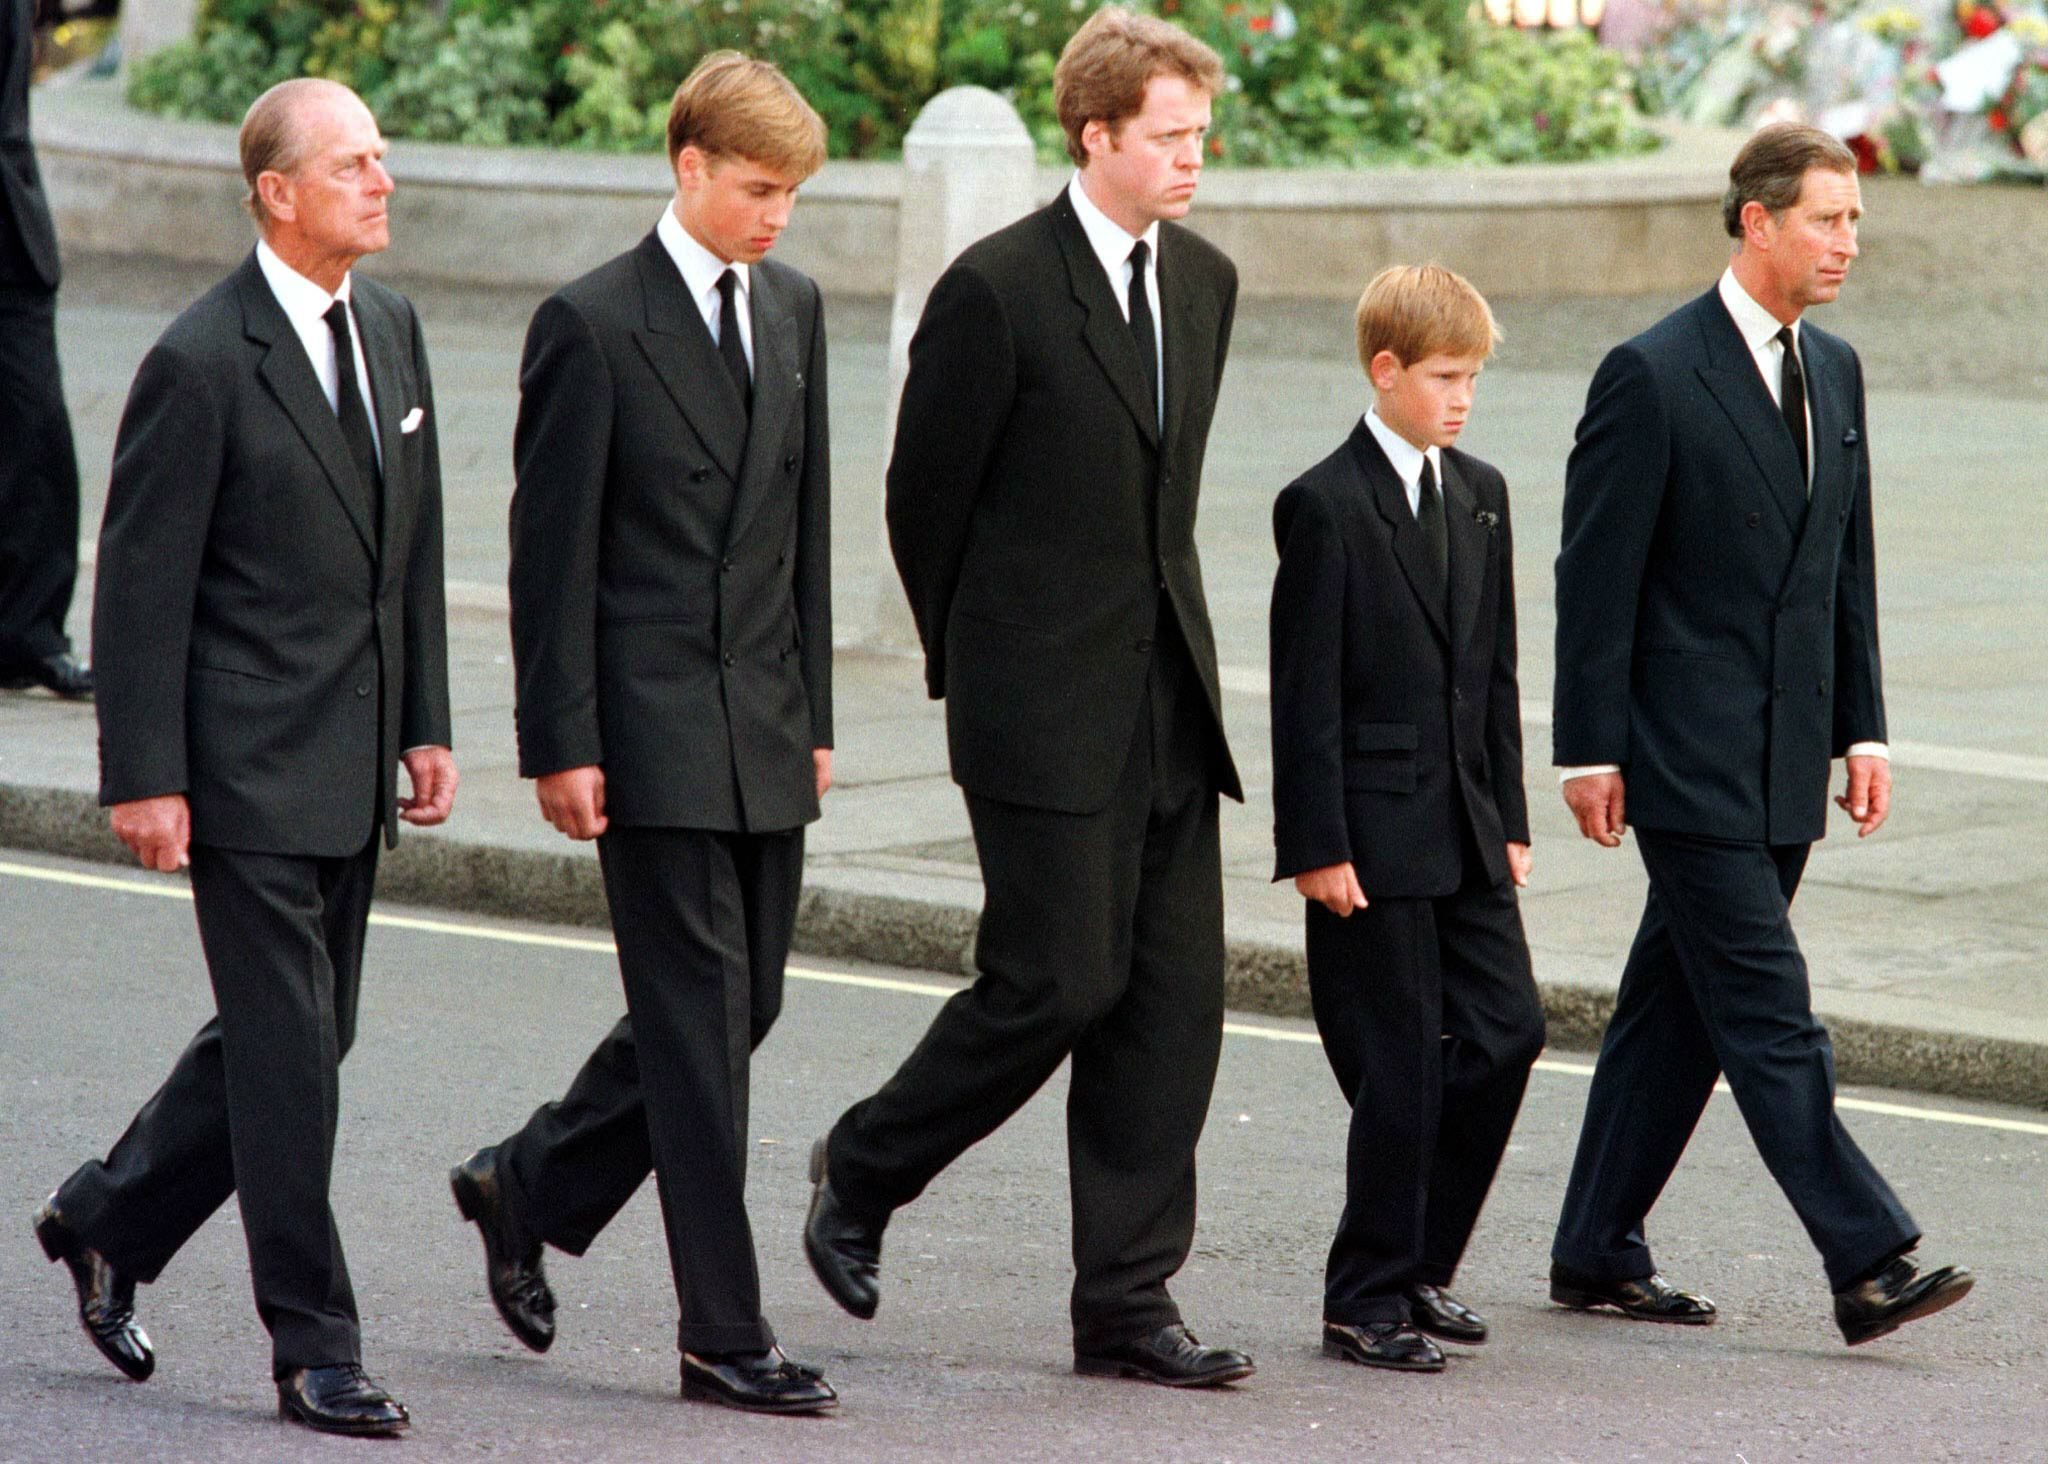 (L to R) The Duke of Edinburgh, Prince W